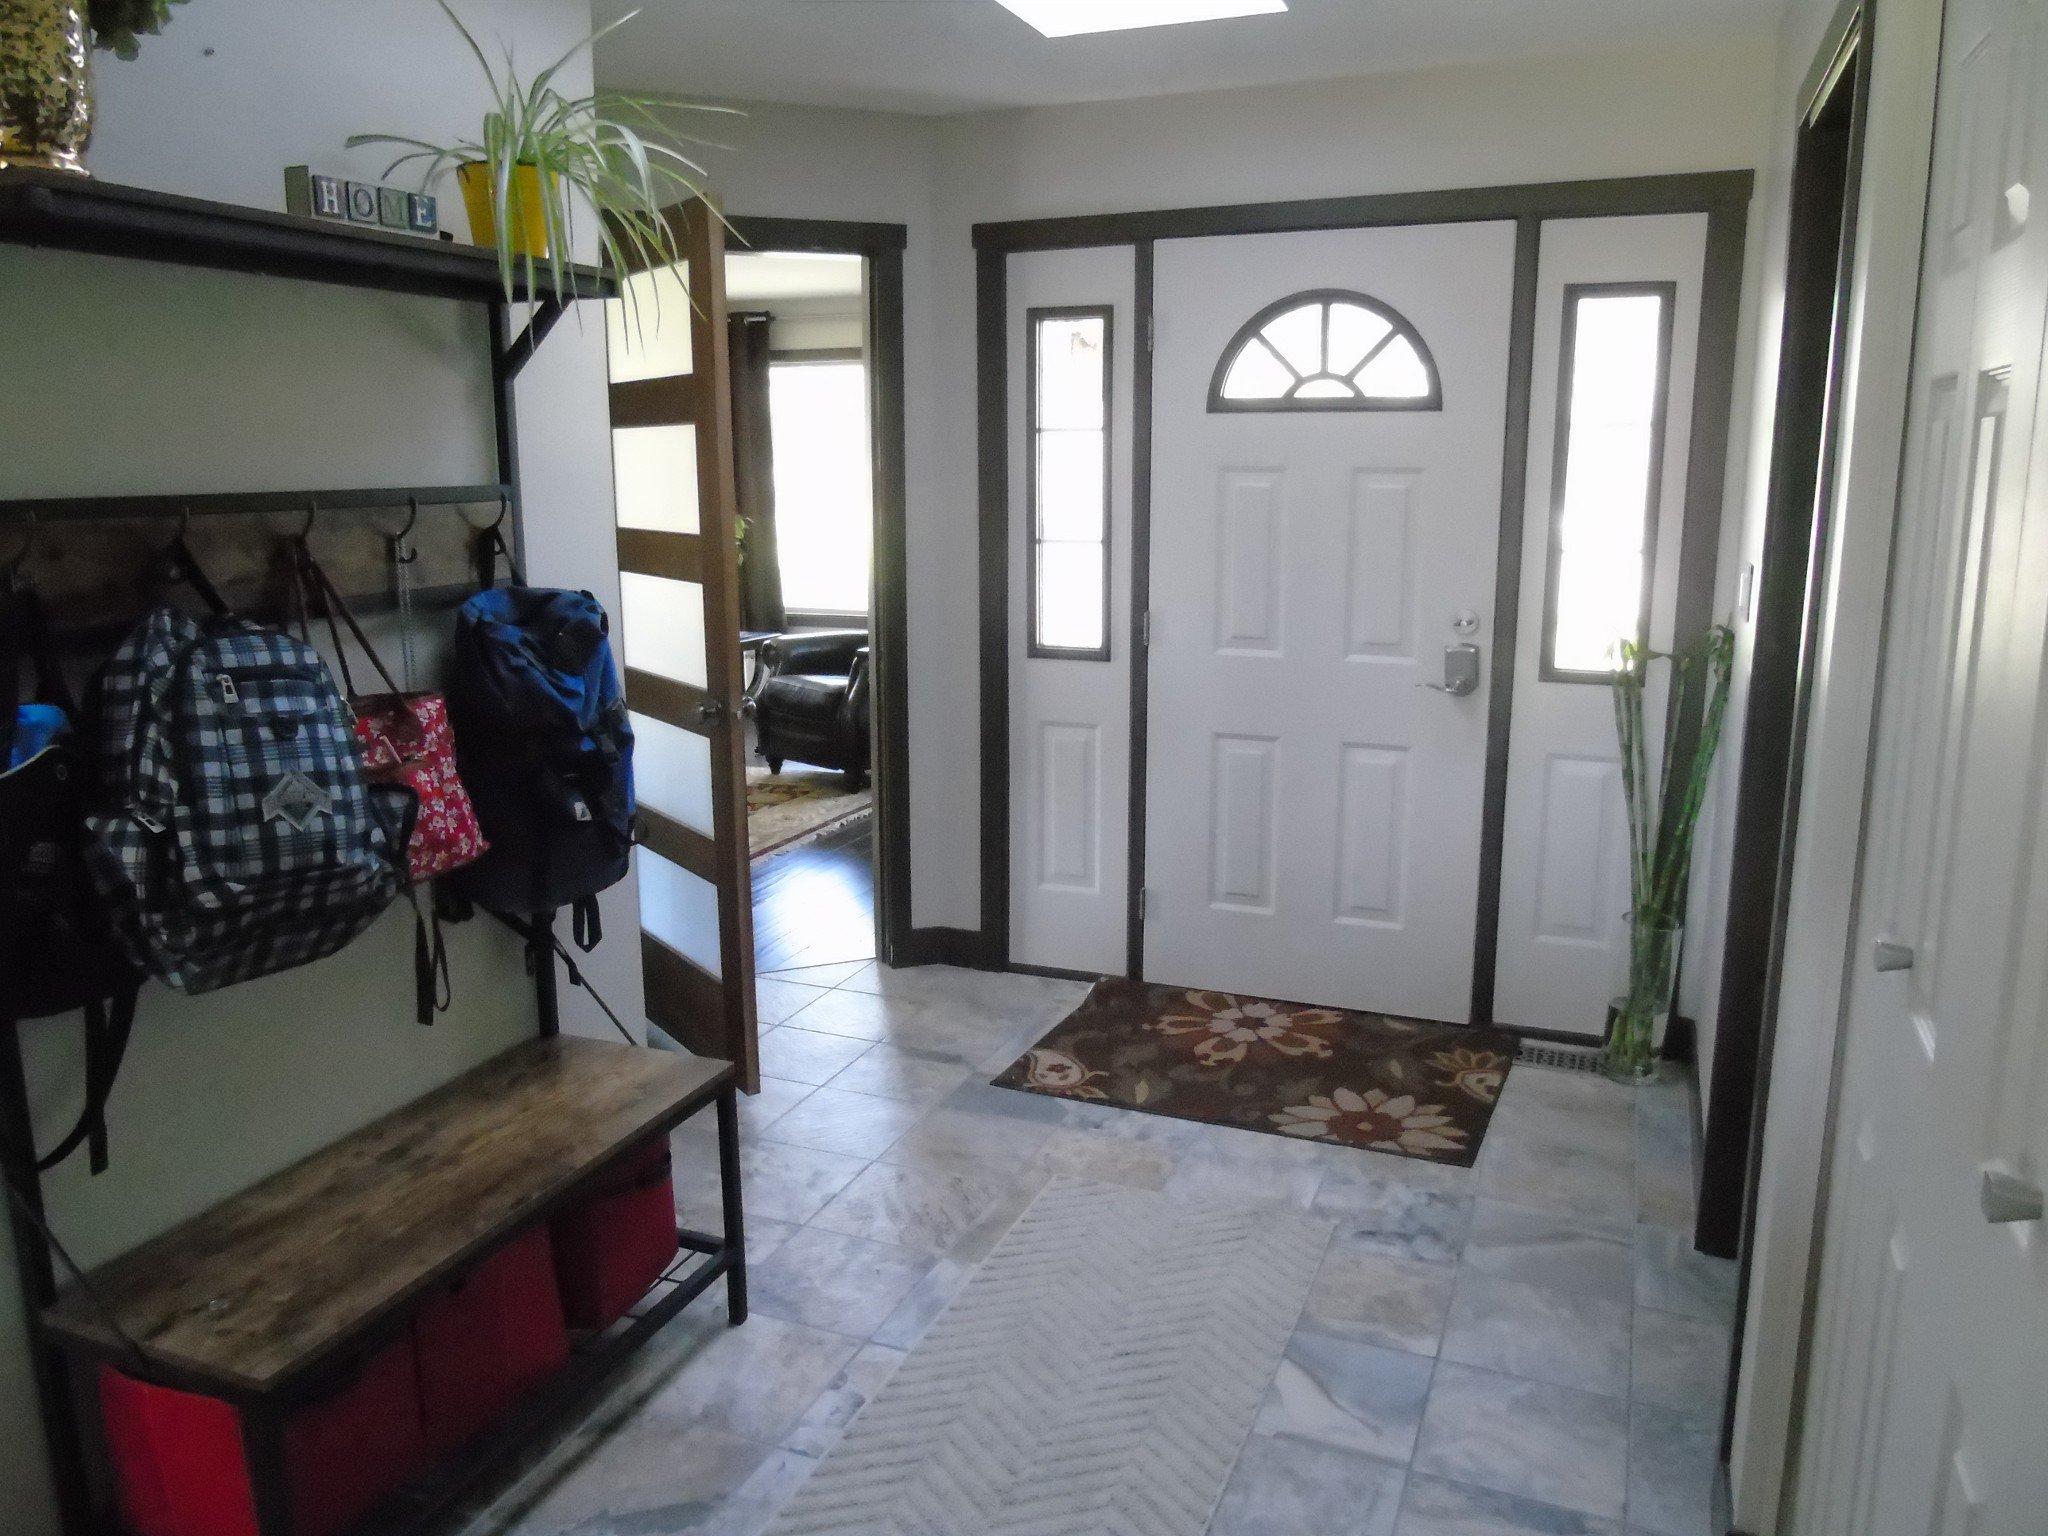 Photo 11: Photos: 6490 Barnhartvale Road in Kamloops: Barnhartvale House for sale : MLS®# New